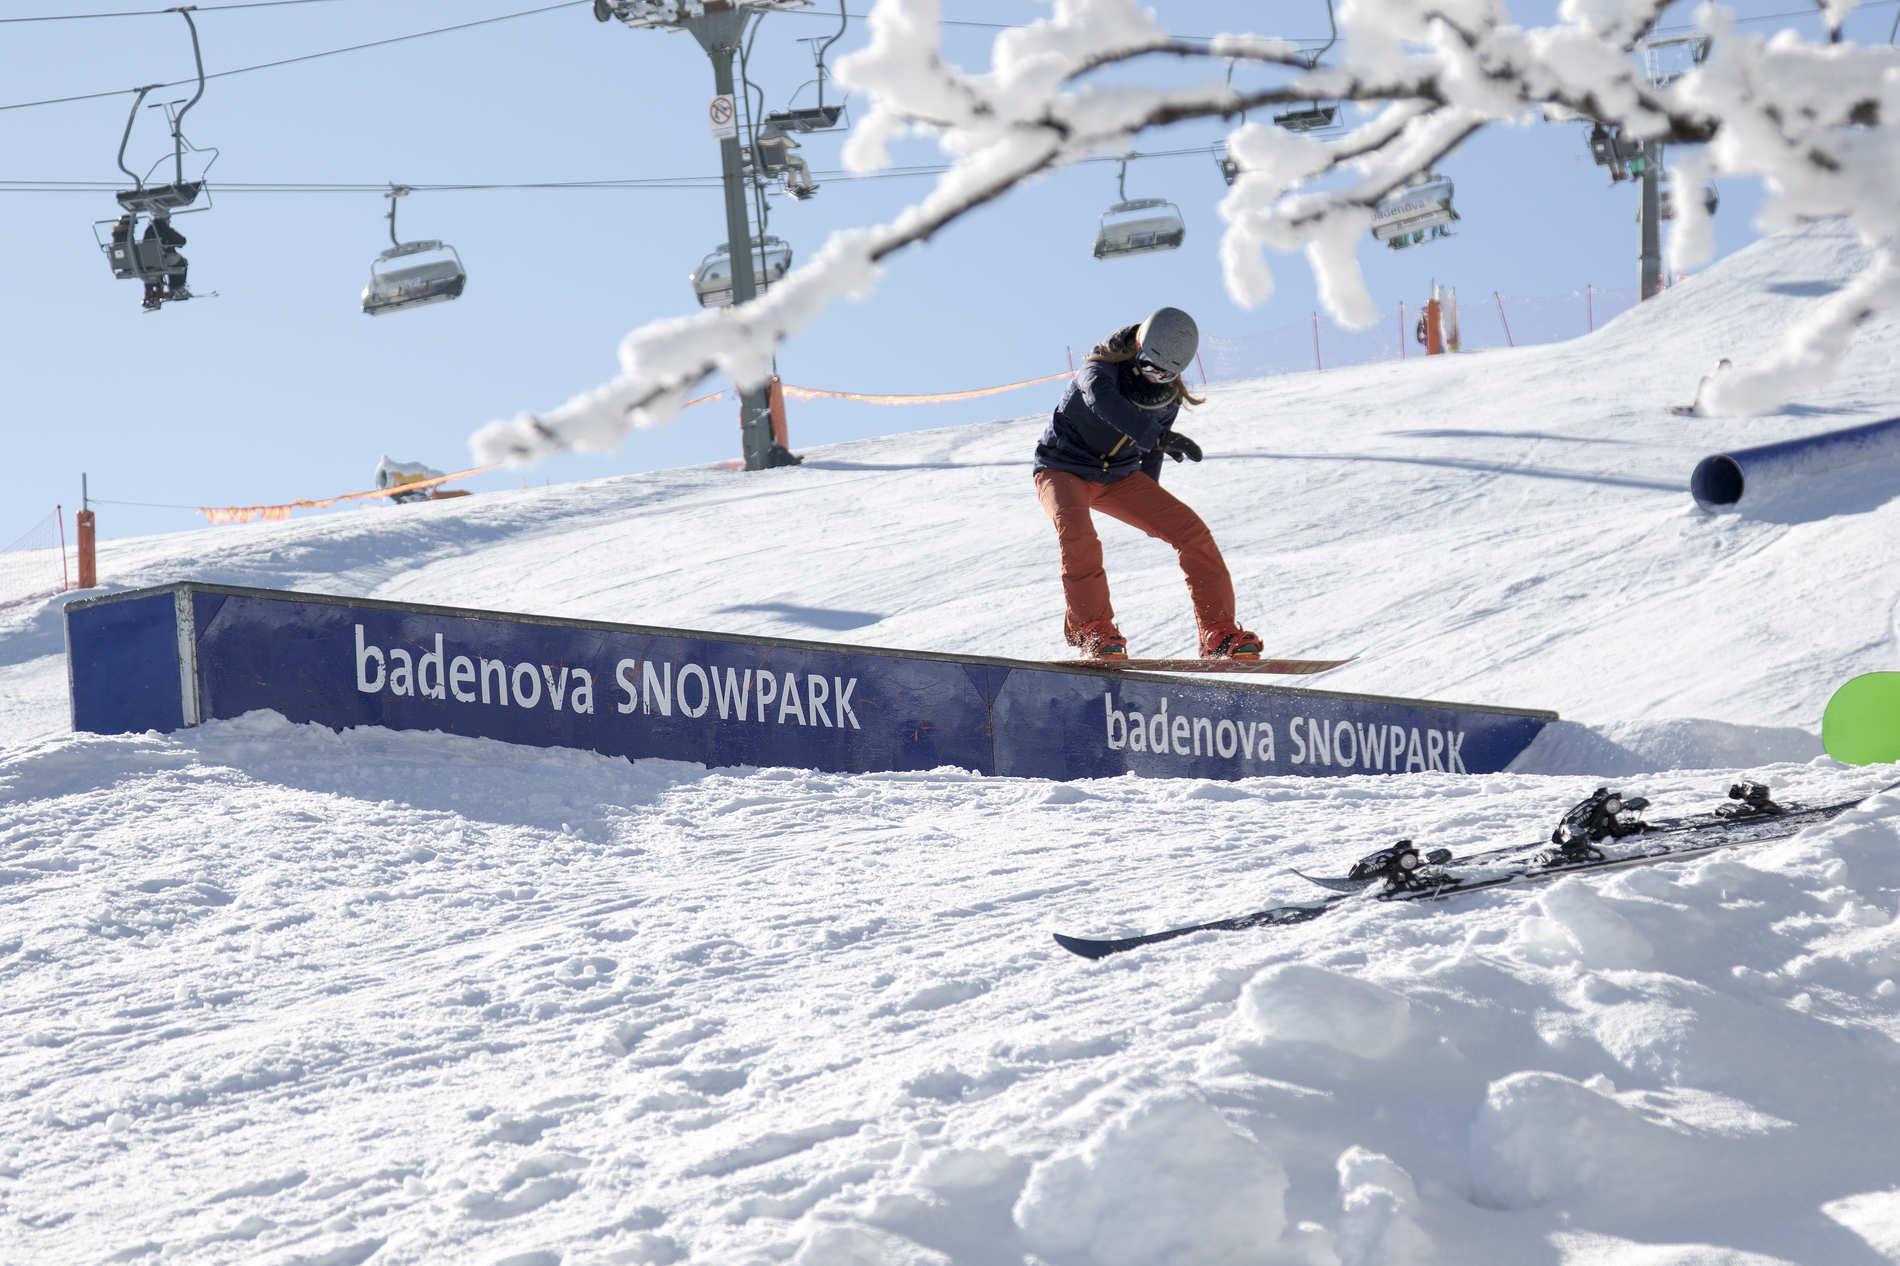 snowpark feldberg 24 02 2018 action sb unknown martin herrmann qparks 9